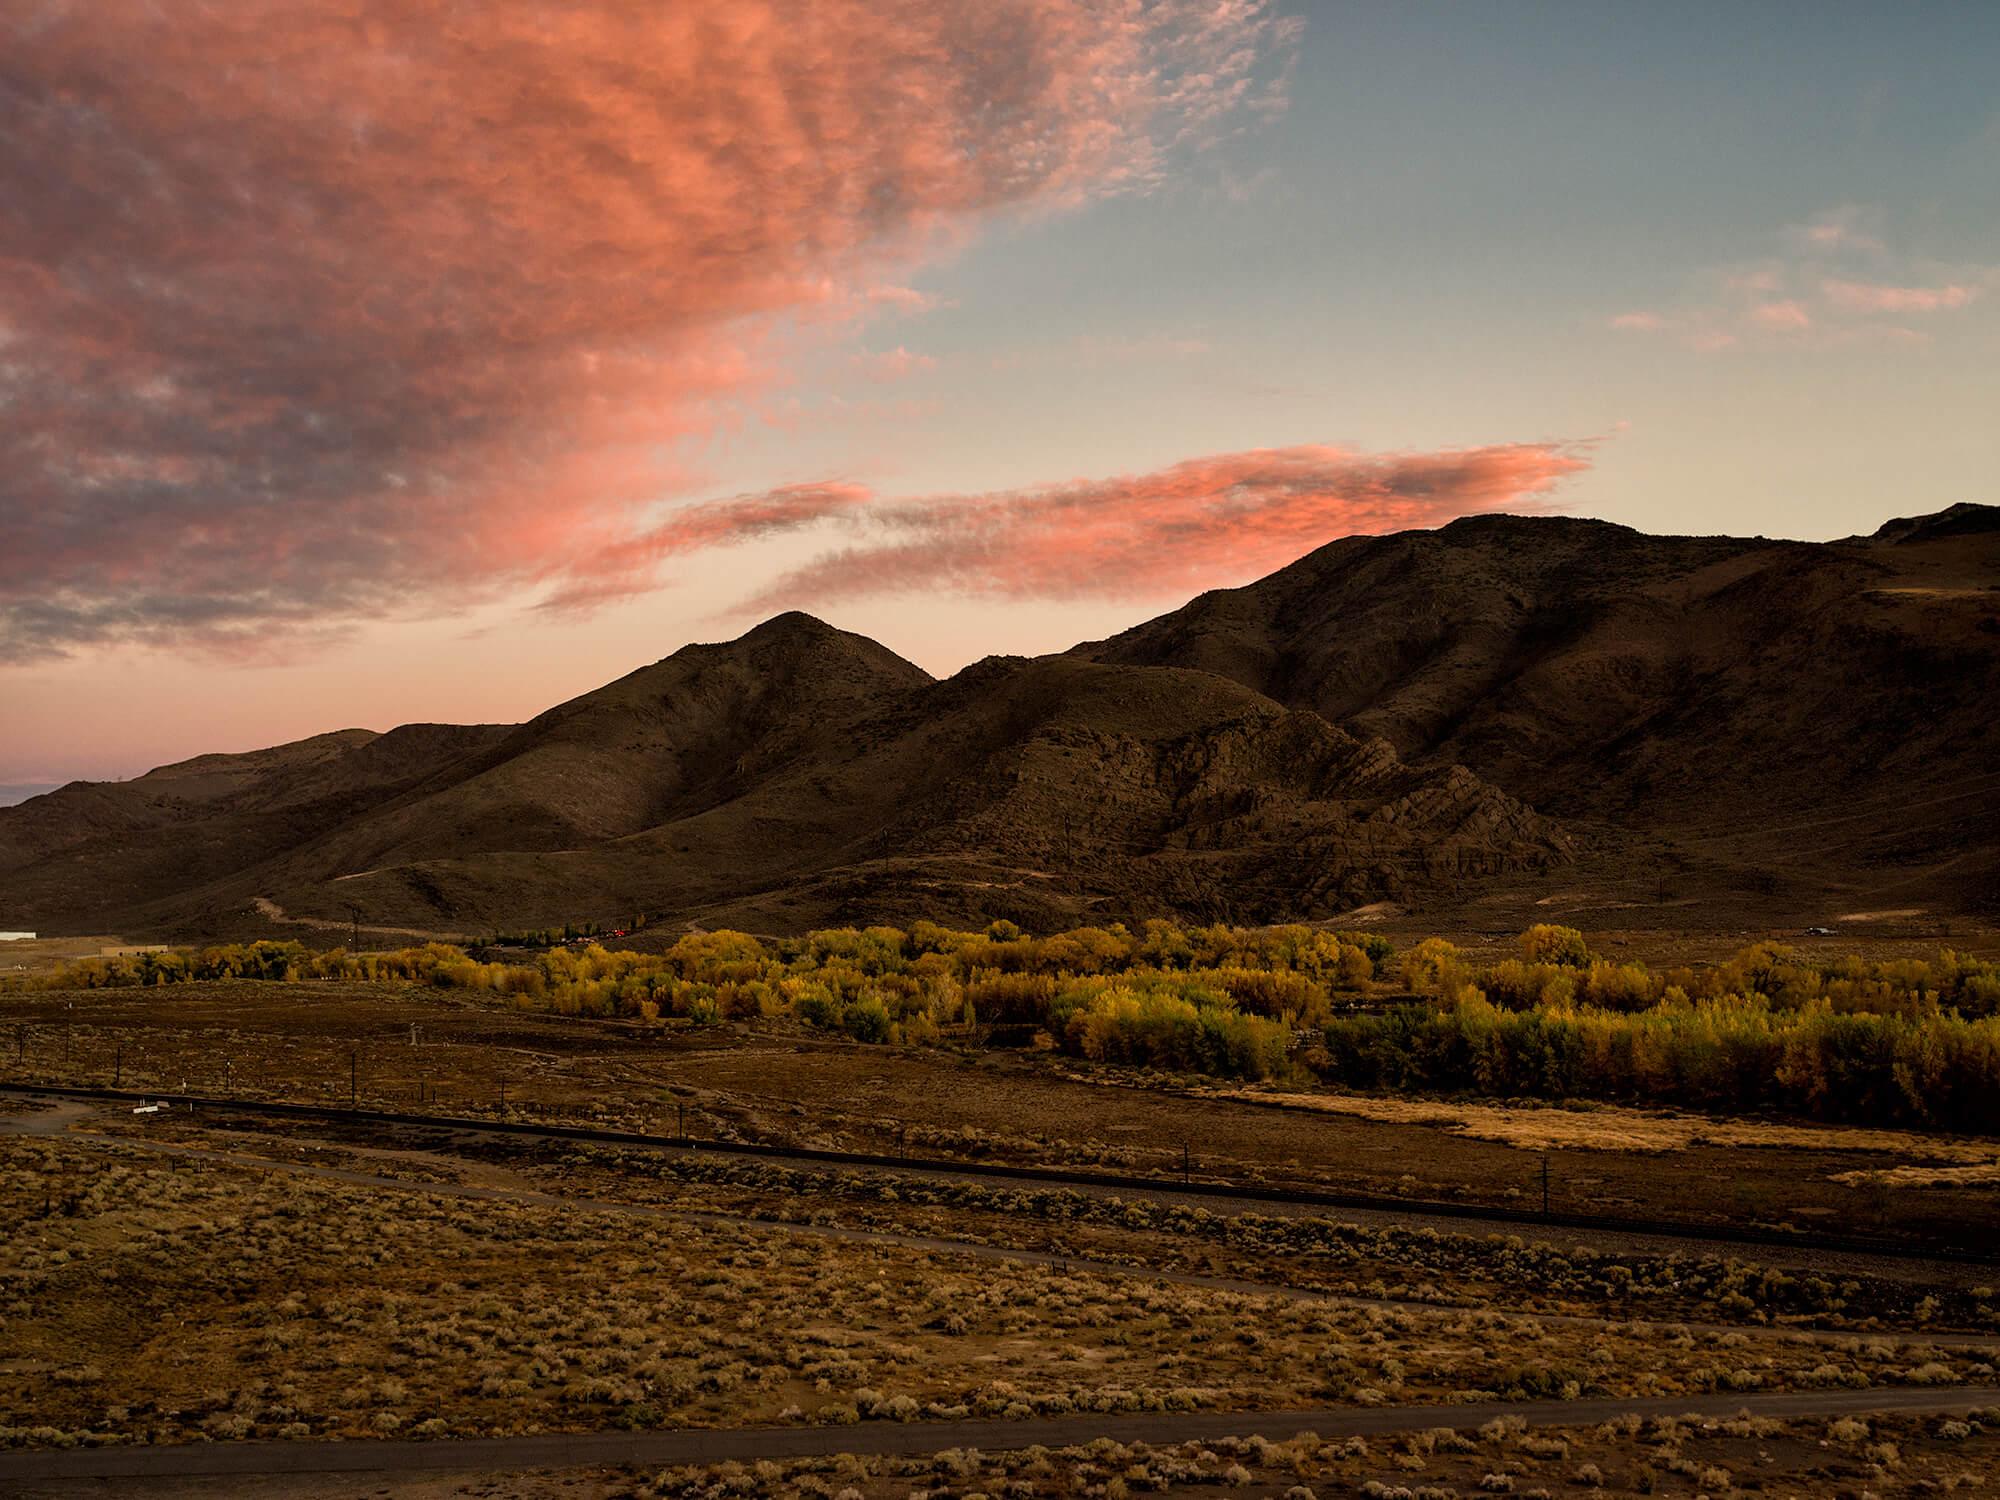 Sun setting behind mountain in Nevada